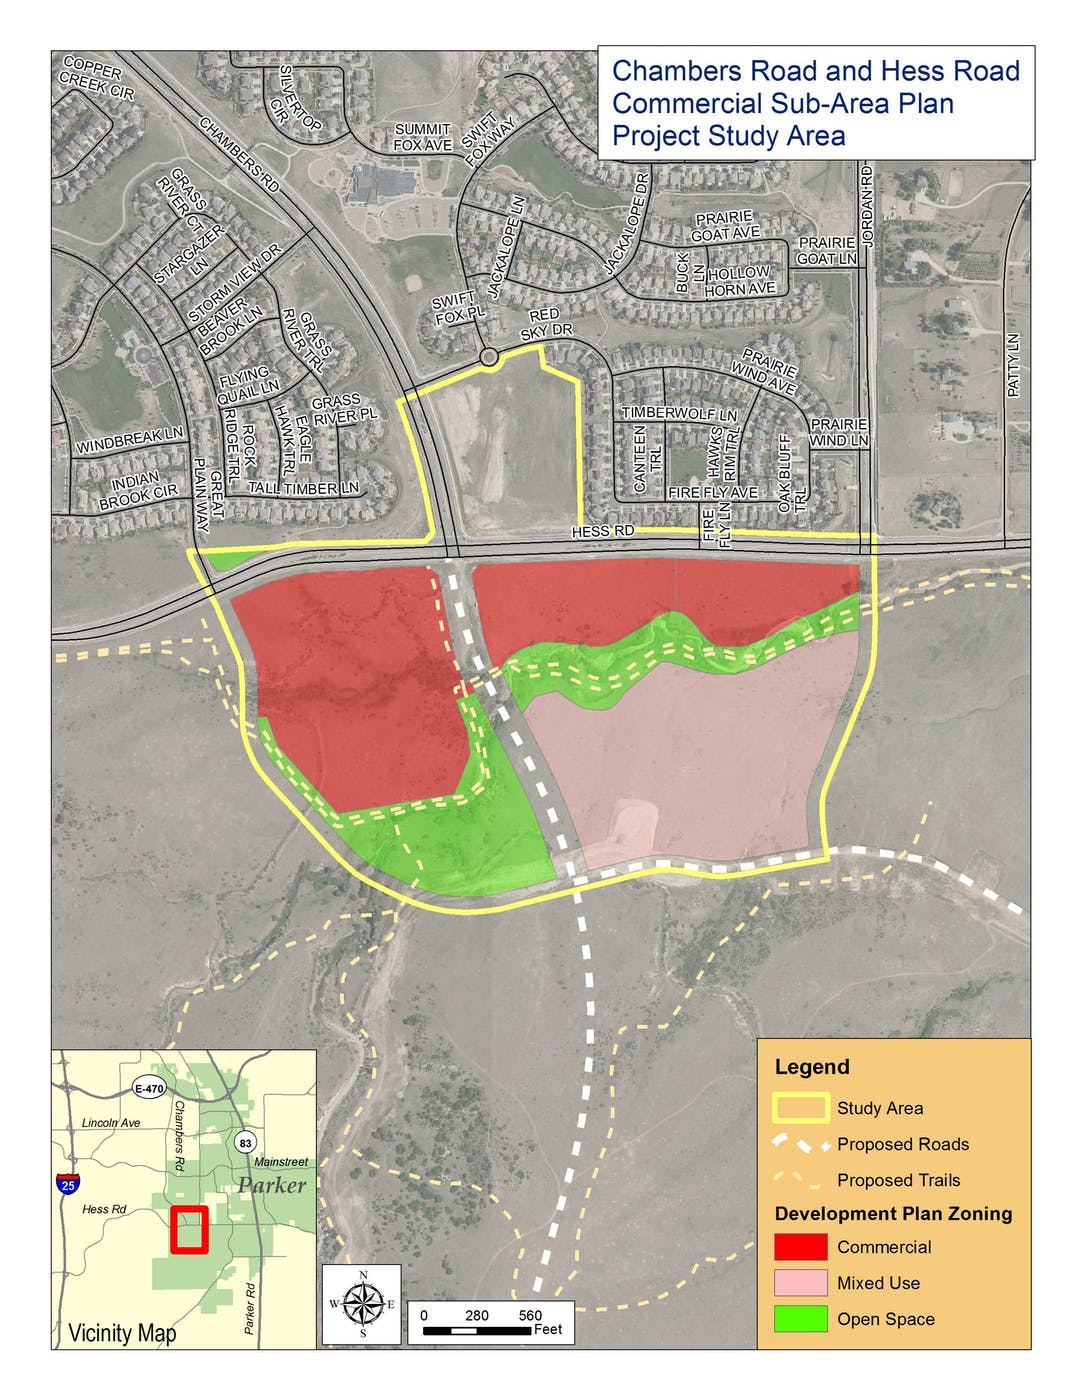 View of Chambers and Hess Subarea Plan Study Area